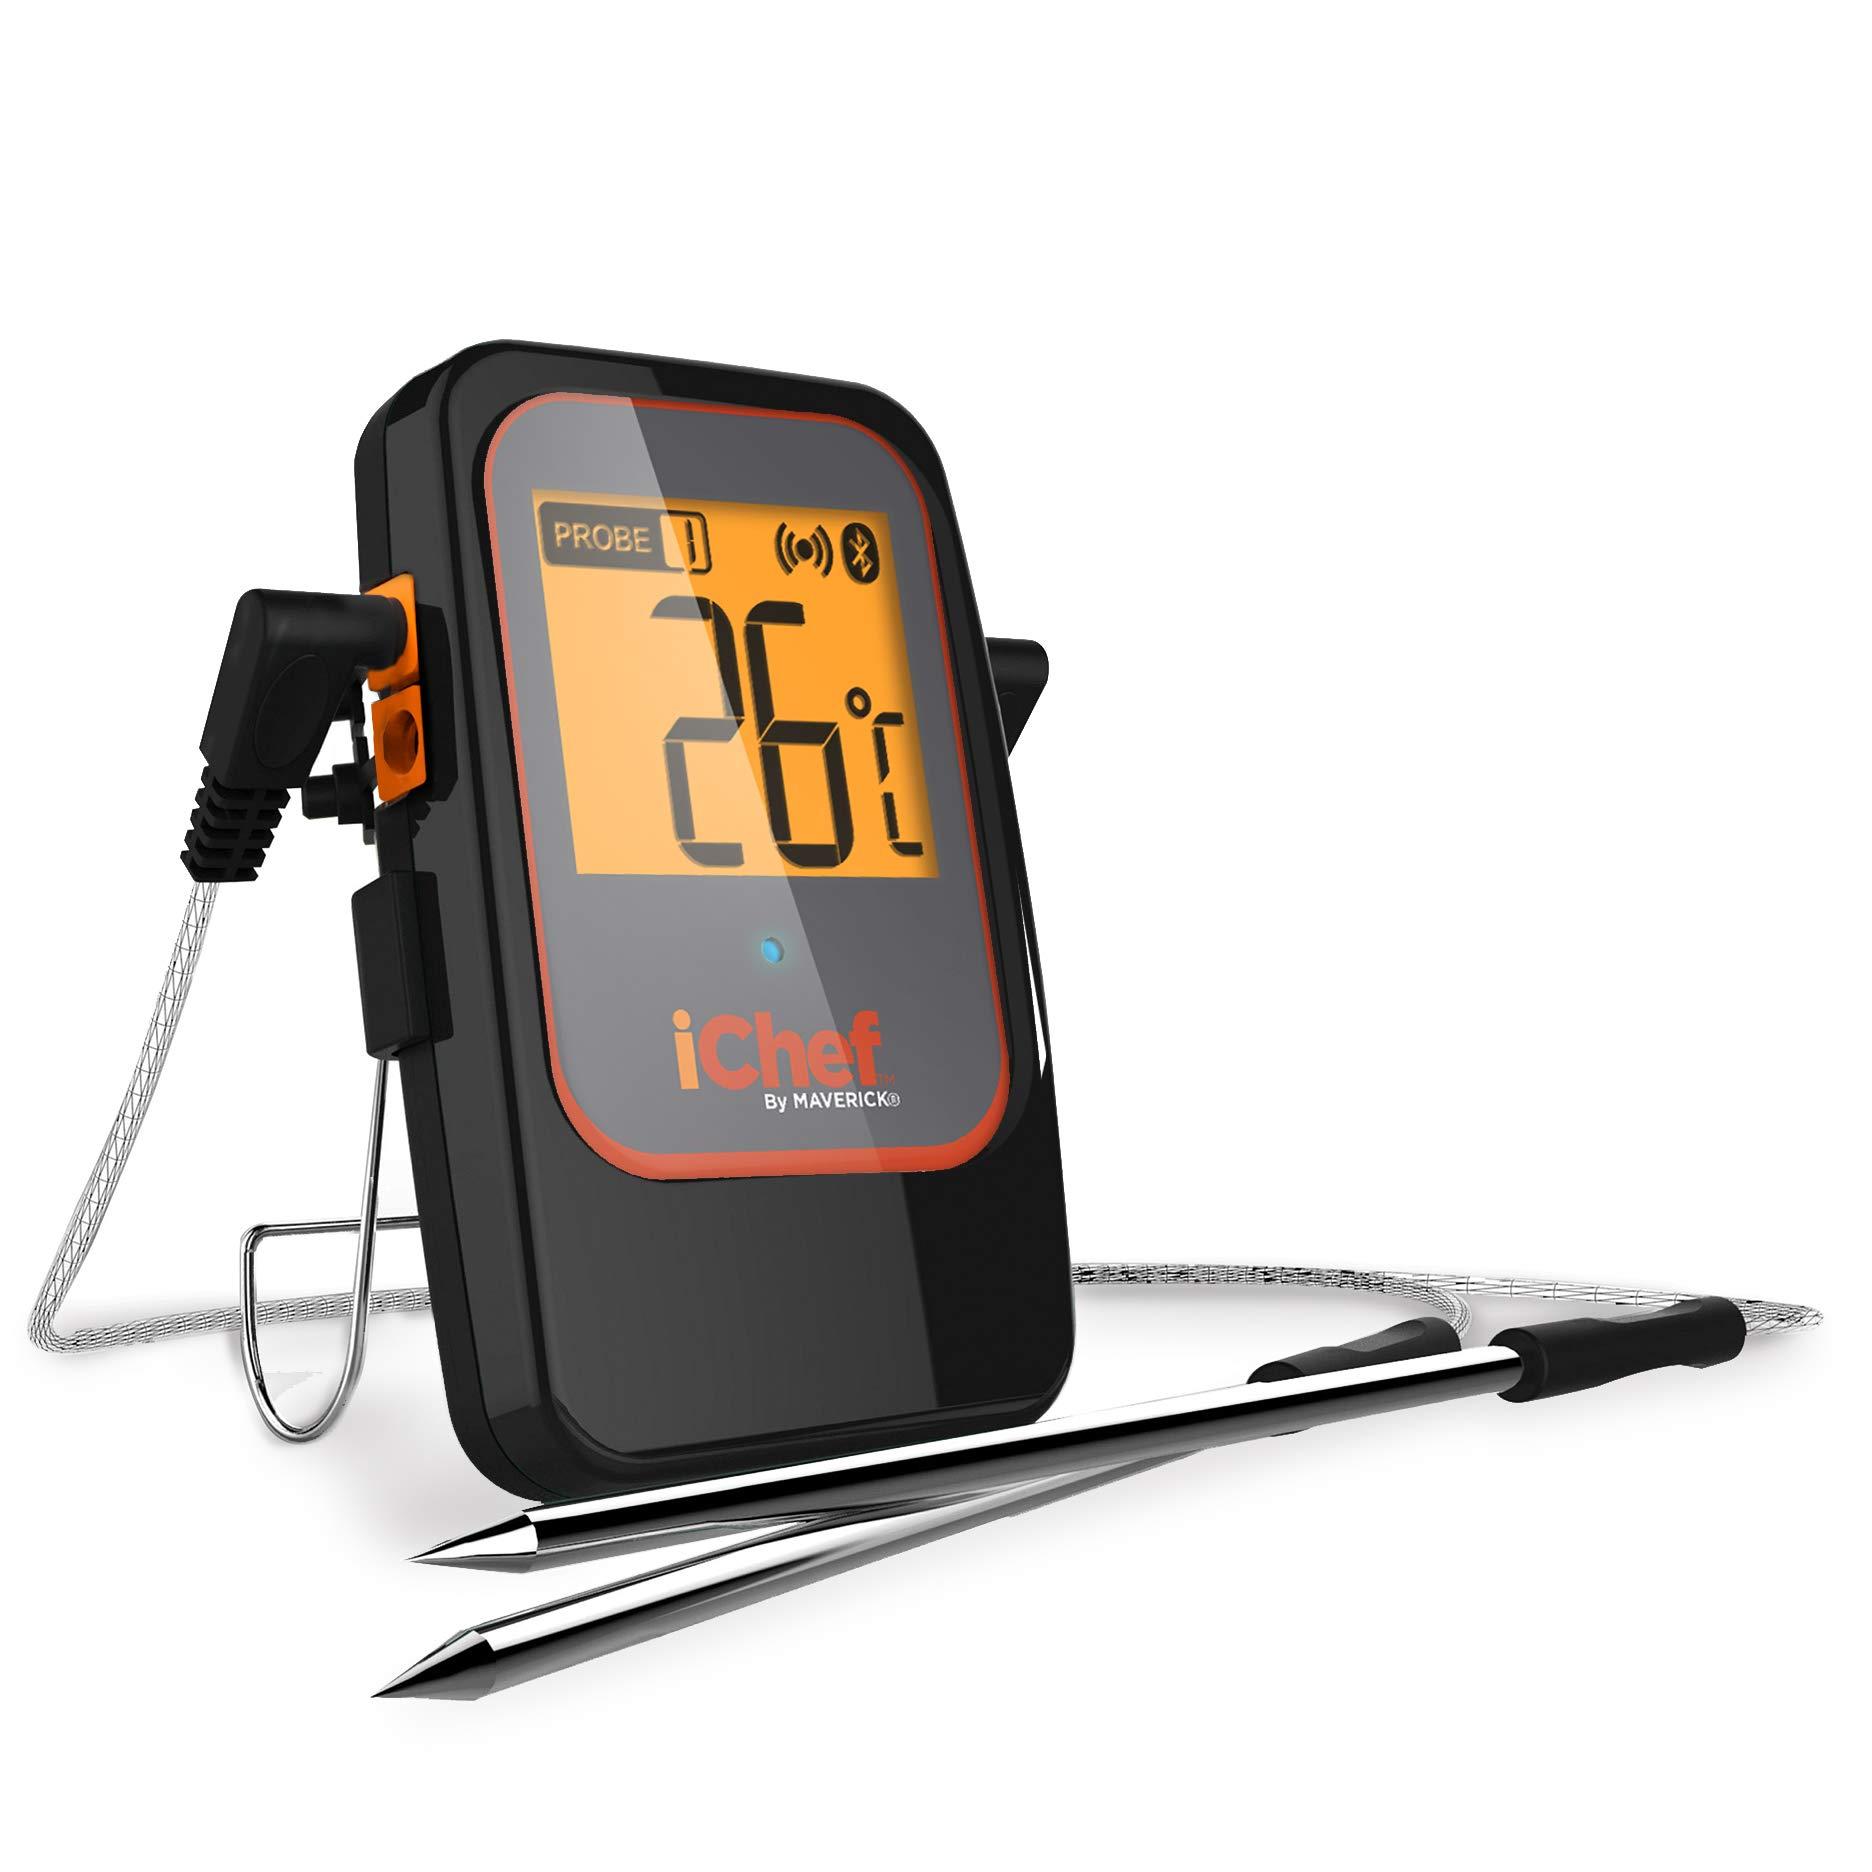 Maverick BT-600 iChef Bluetooth Digital Instant Read Cooking Kitchen Grilling Smoker BBQ Wireless Probe Meat Thermometer, Black